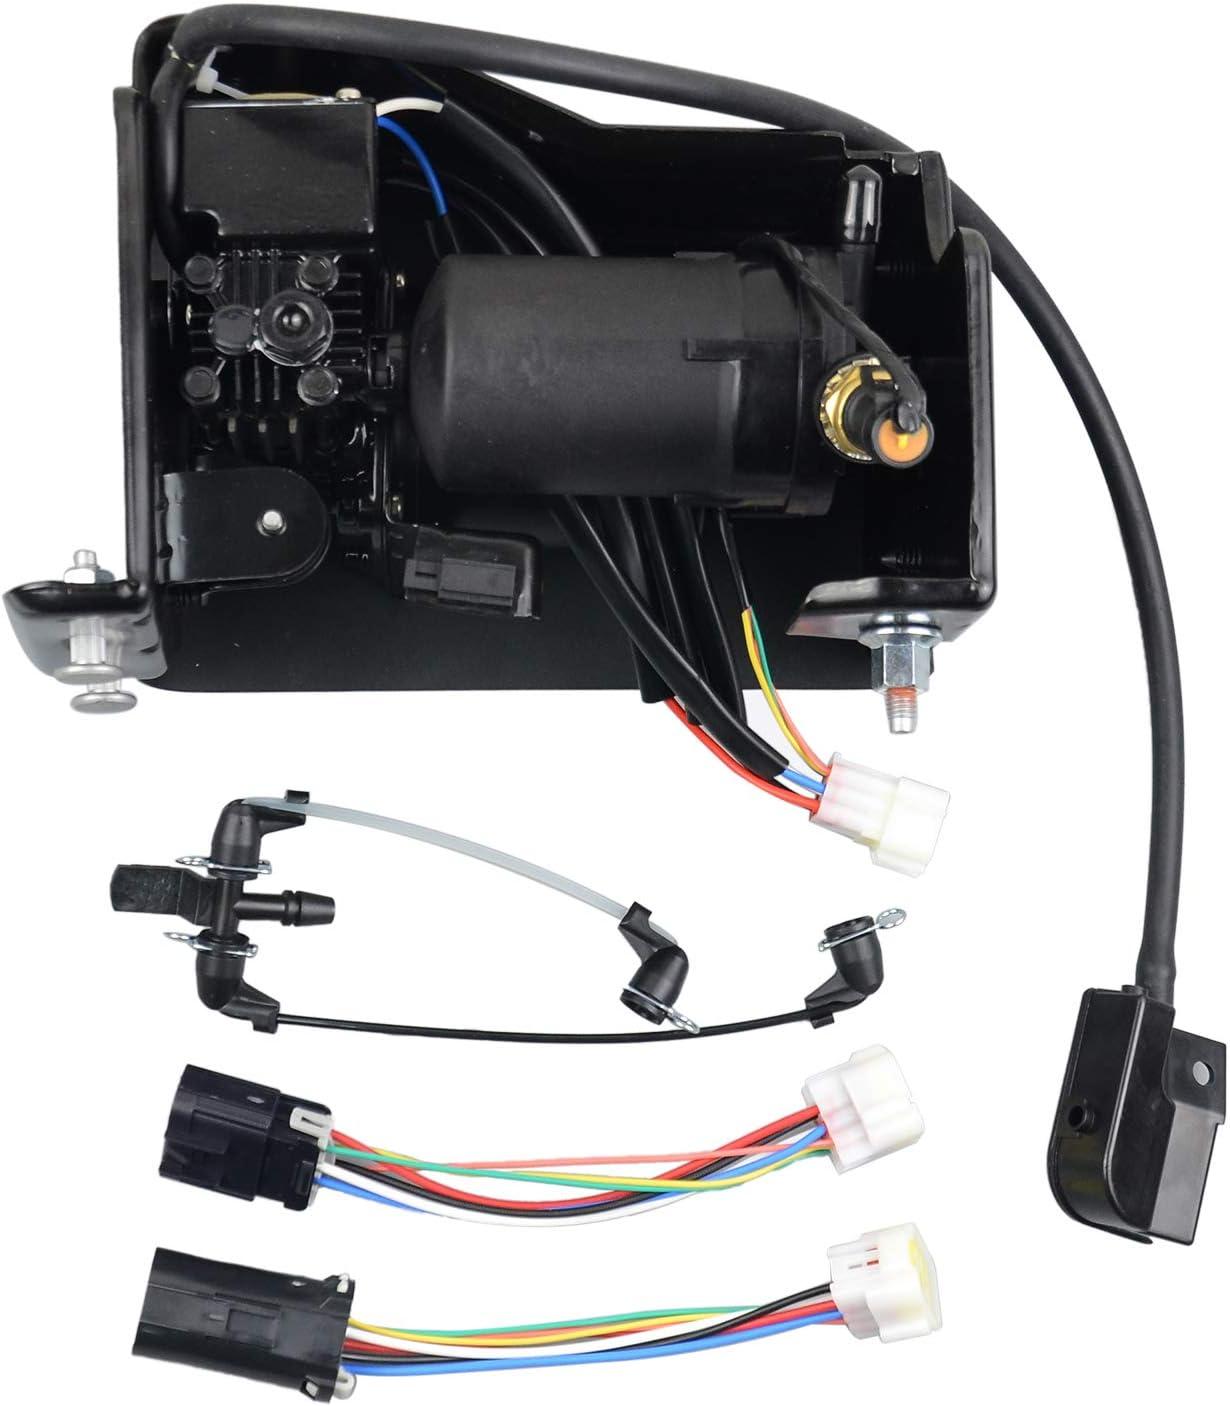 949-099 949-001 Air Ride Suspension Compressor Pump Compatible with Chevrolet Avalanche Suburban Tahoe Cadillac Escalade GMC Yukon XL 2001-2013 15254590 19299545